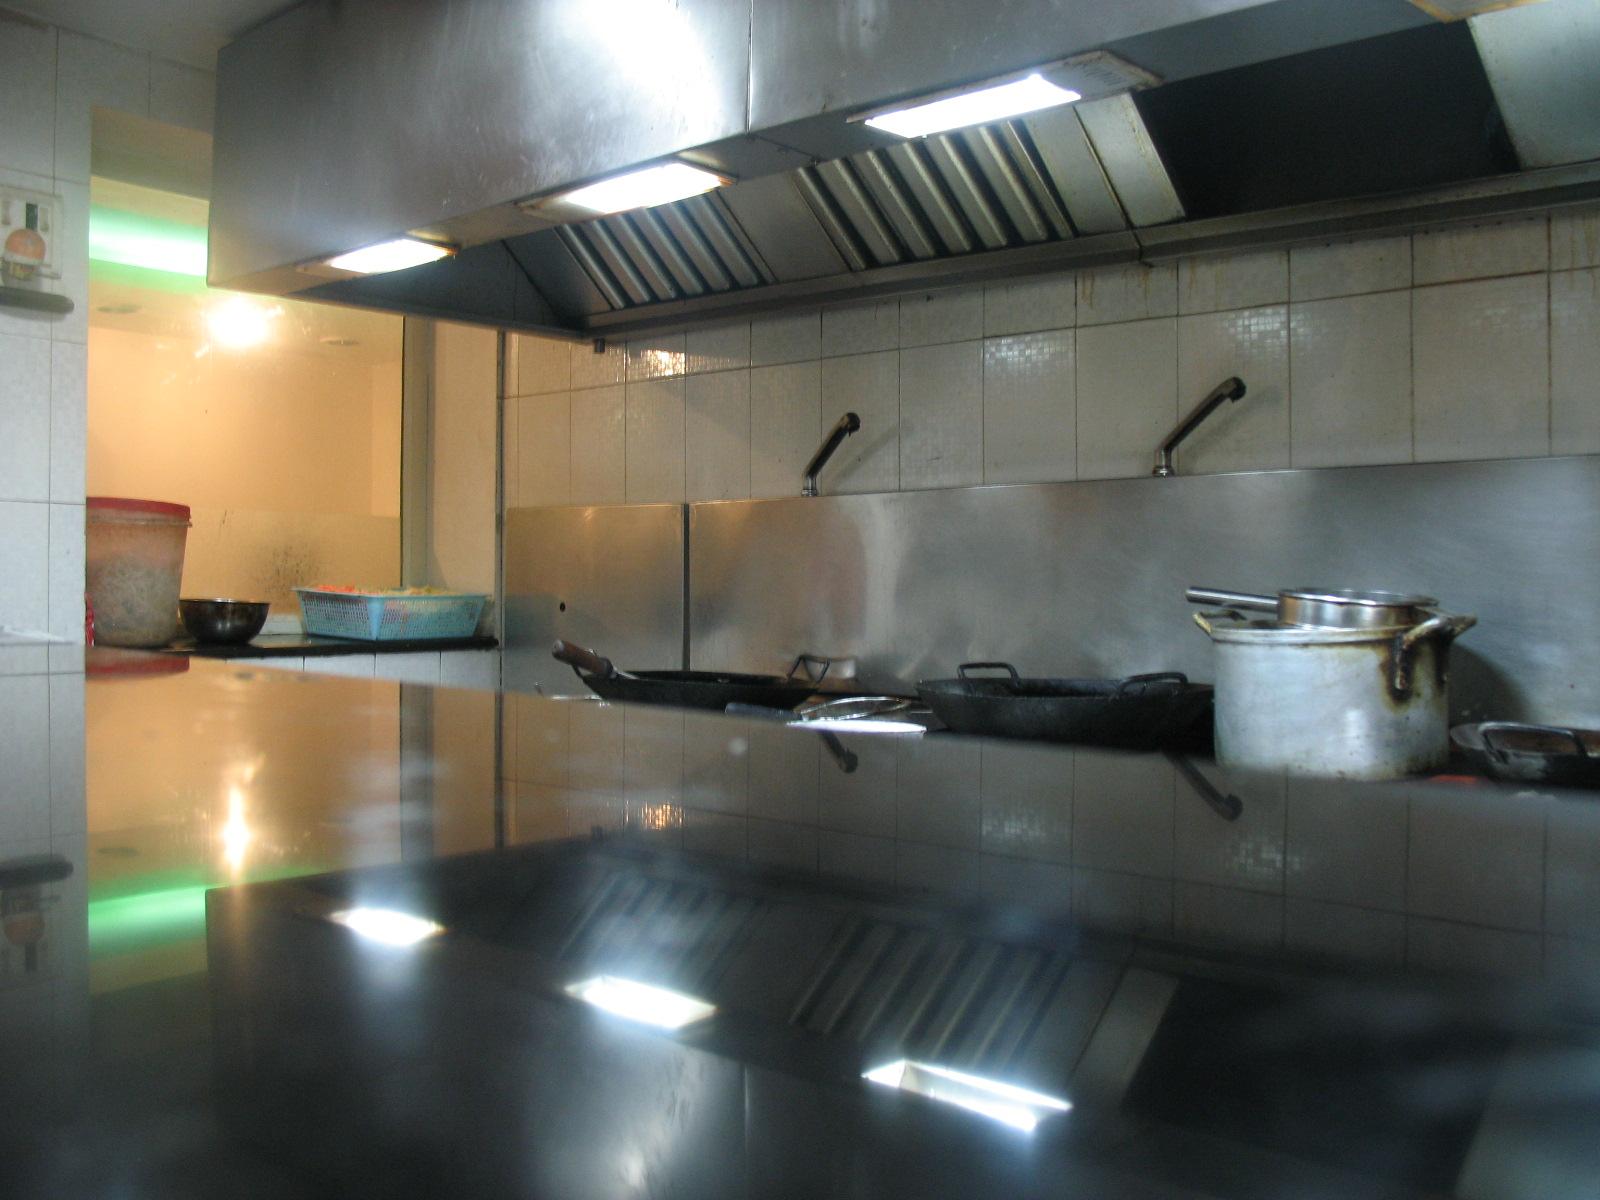 Krazy Kitchen   Nainital Image 3